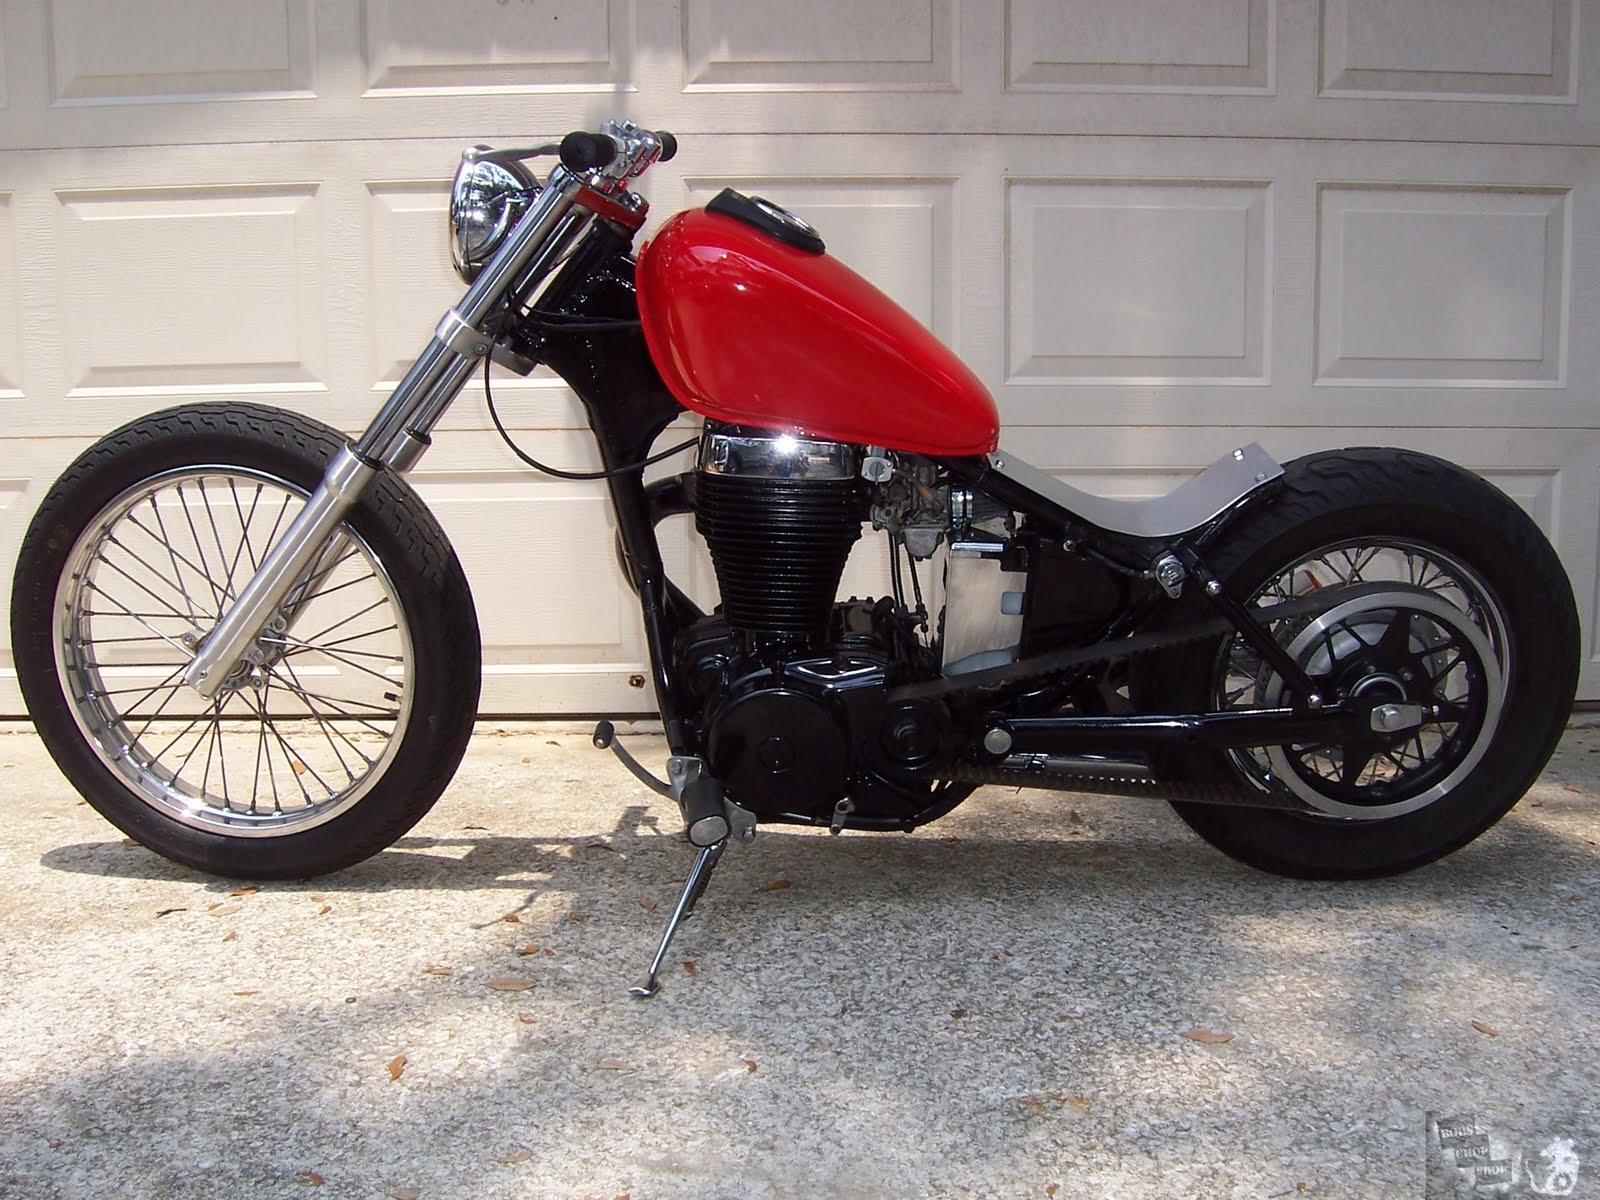 find best wallpapers  Suzuki savage ls650 bobber   Motorcycle Pictures